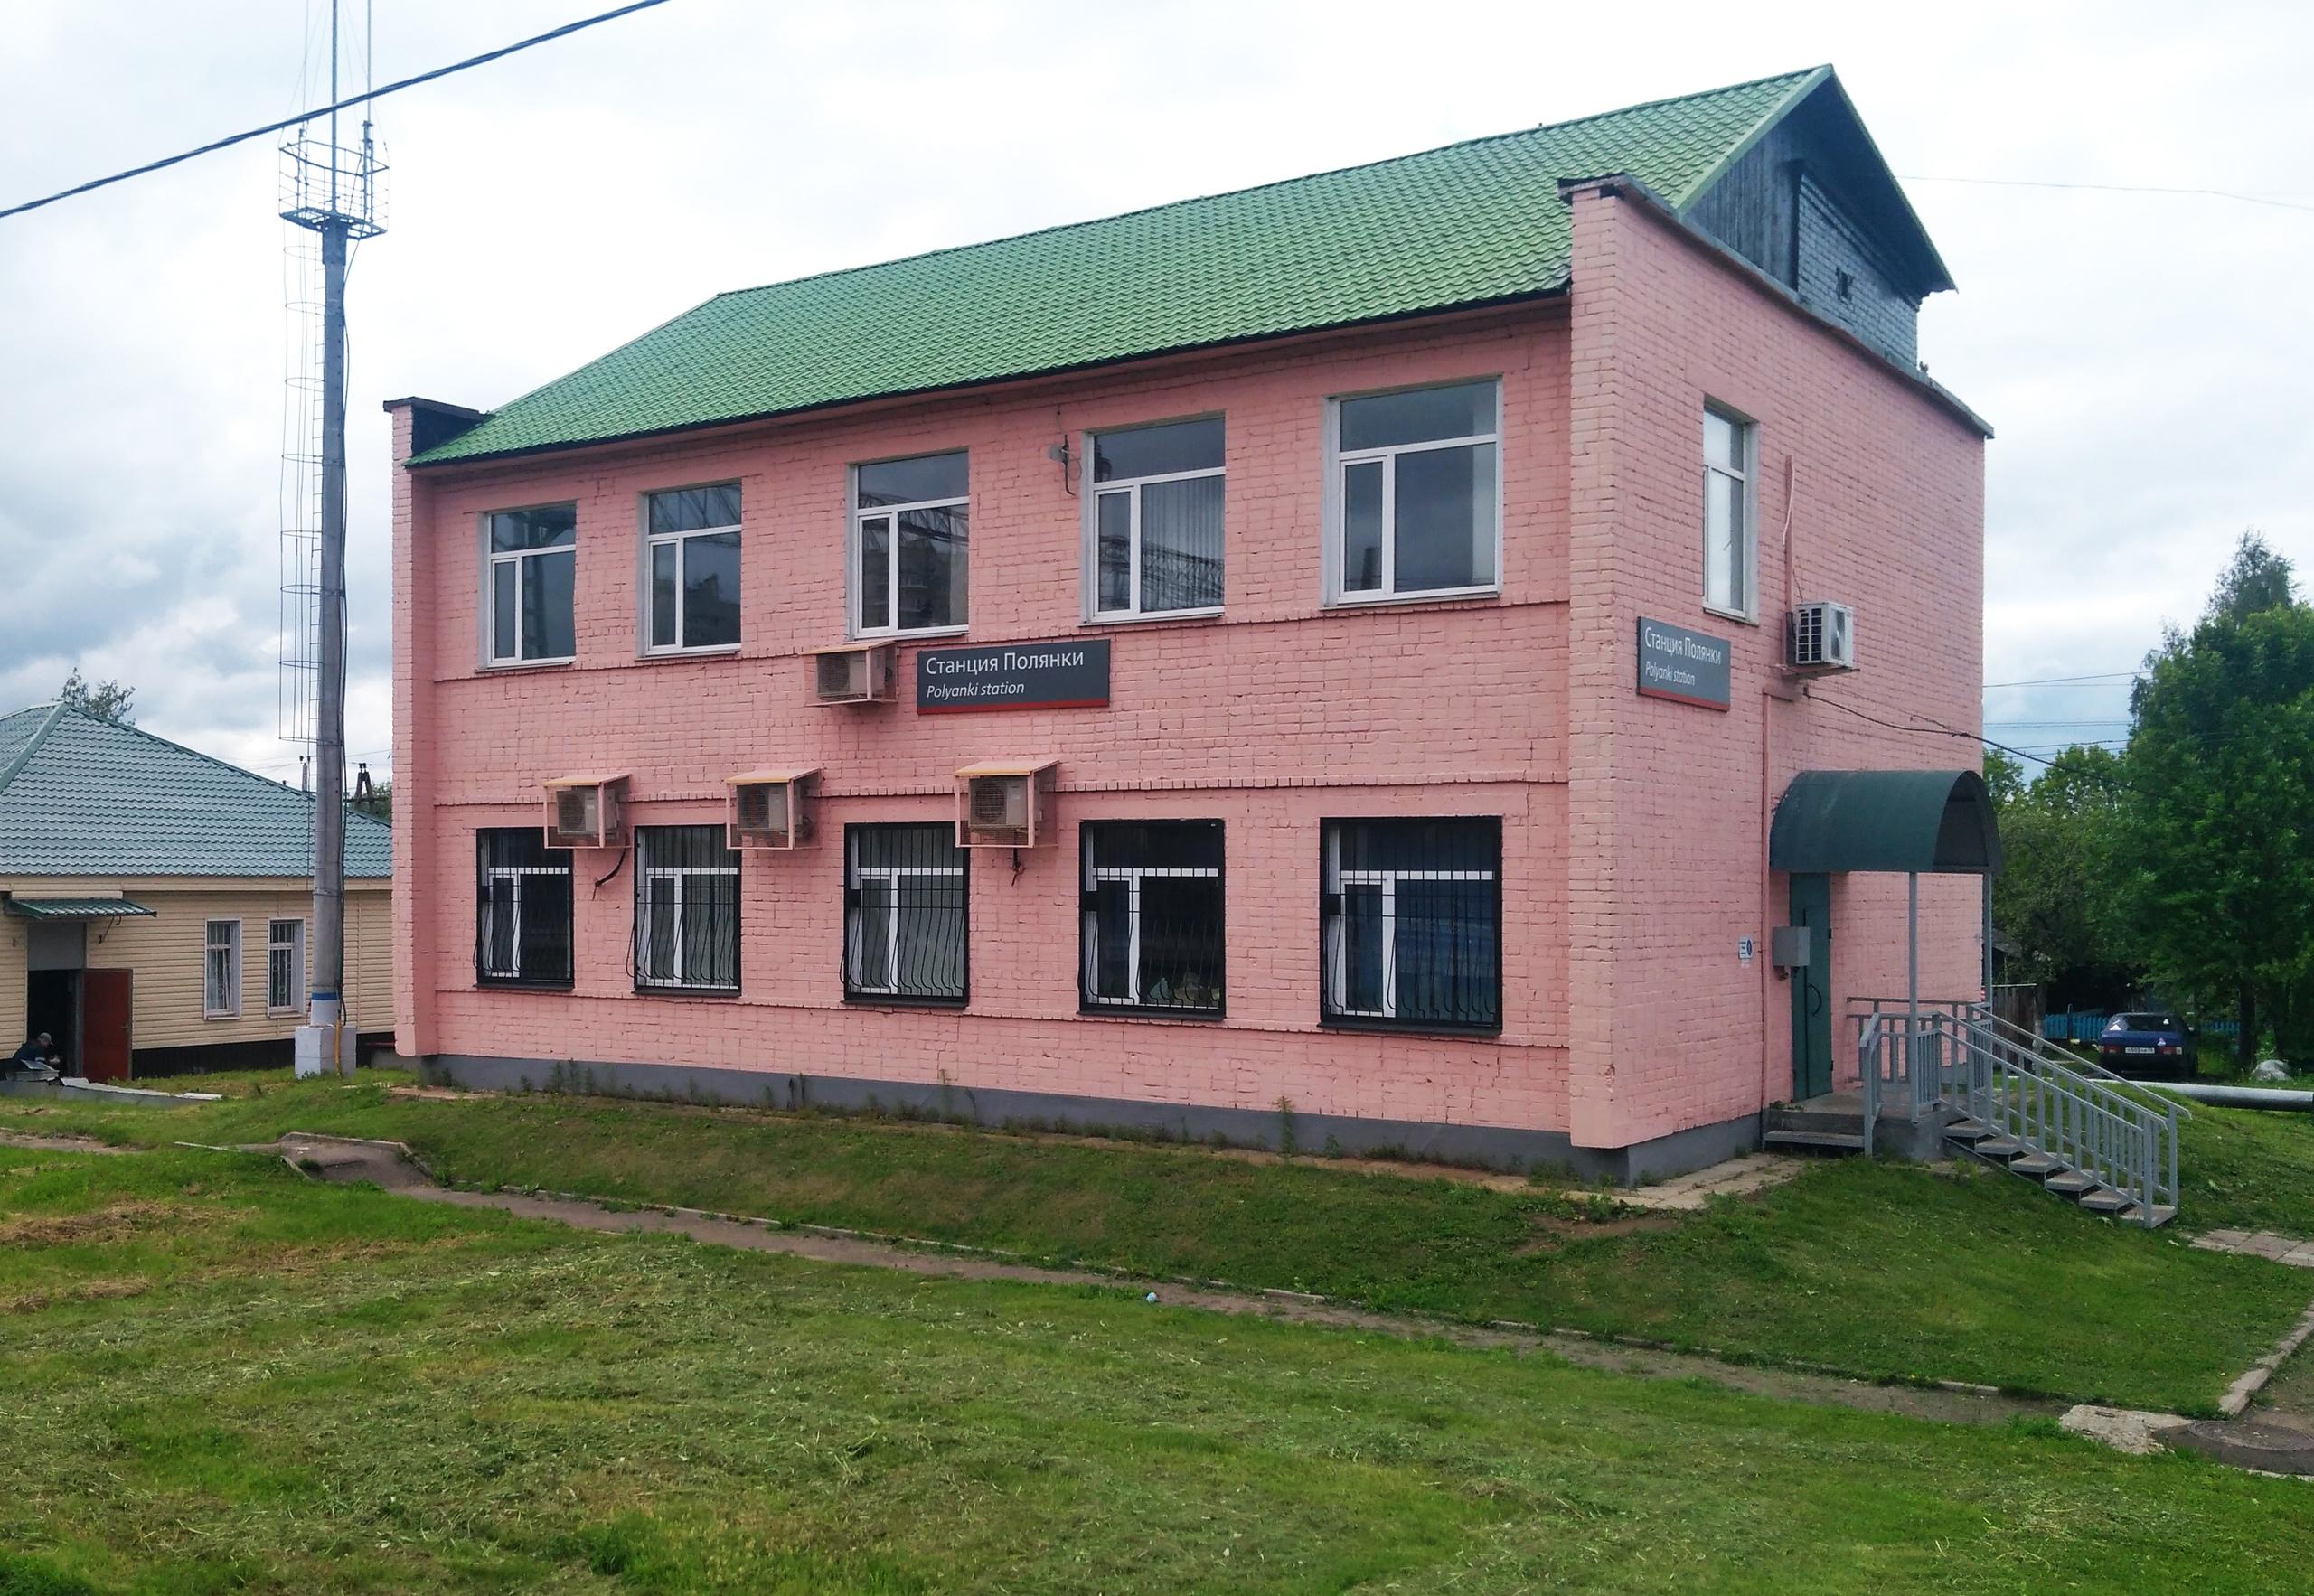 Станция Полянки